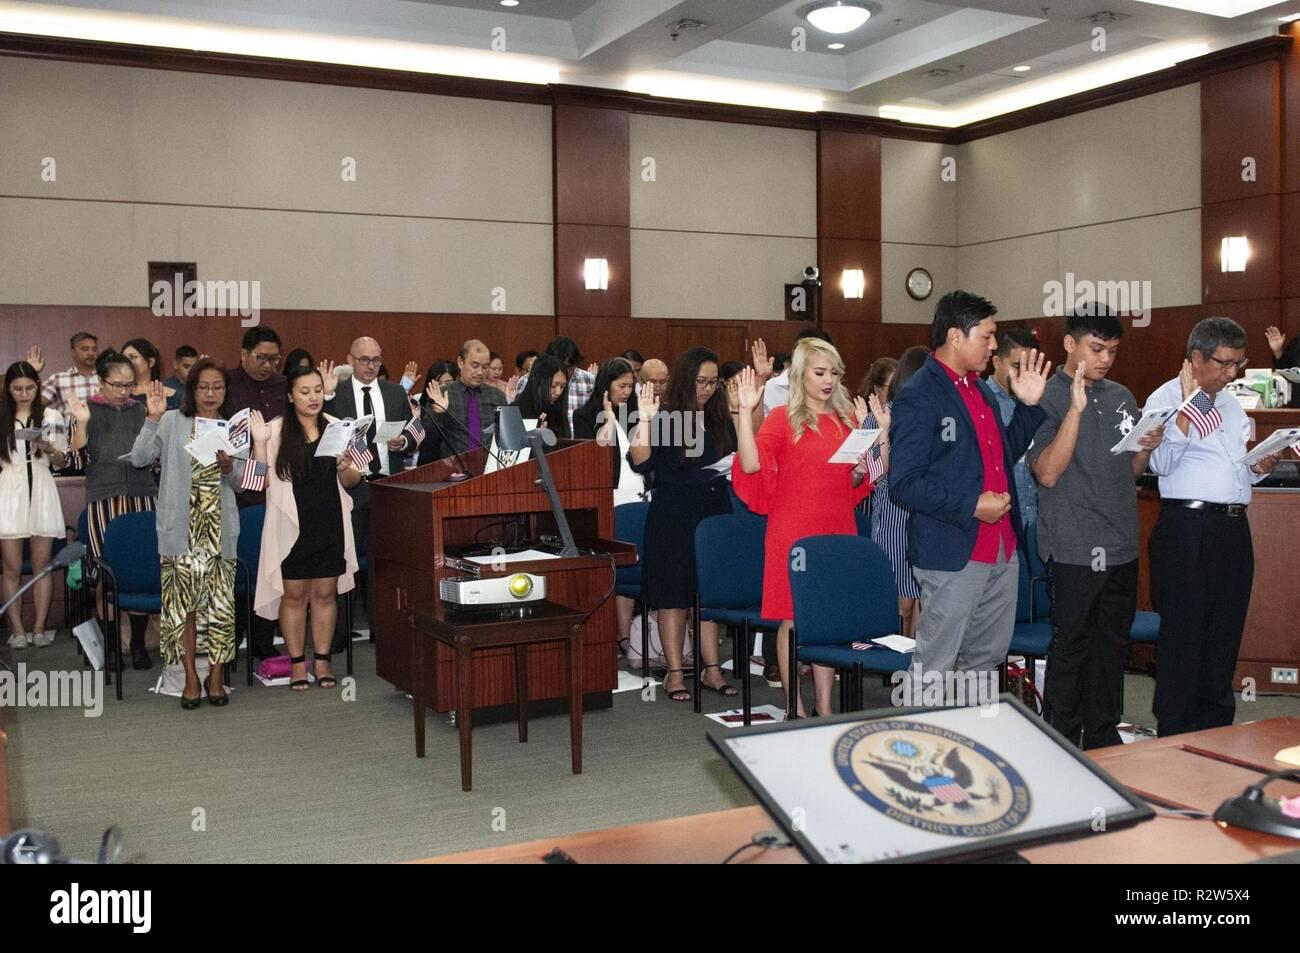 Oath Allegiance Naturalization Ceremony Stock Photos & Oath